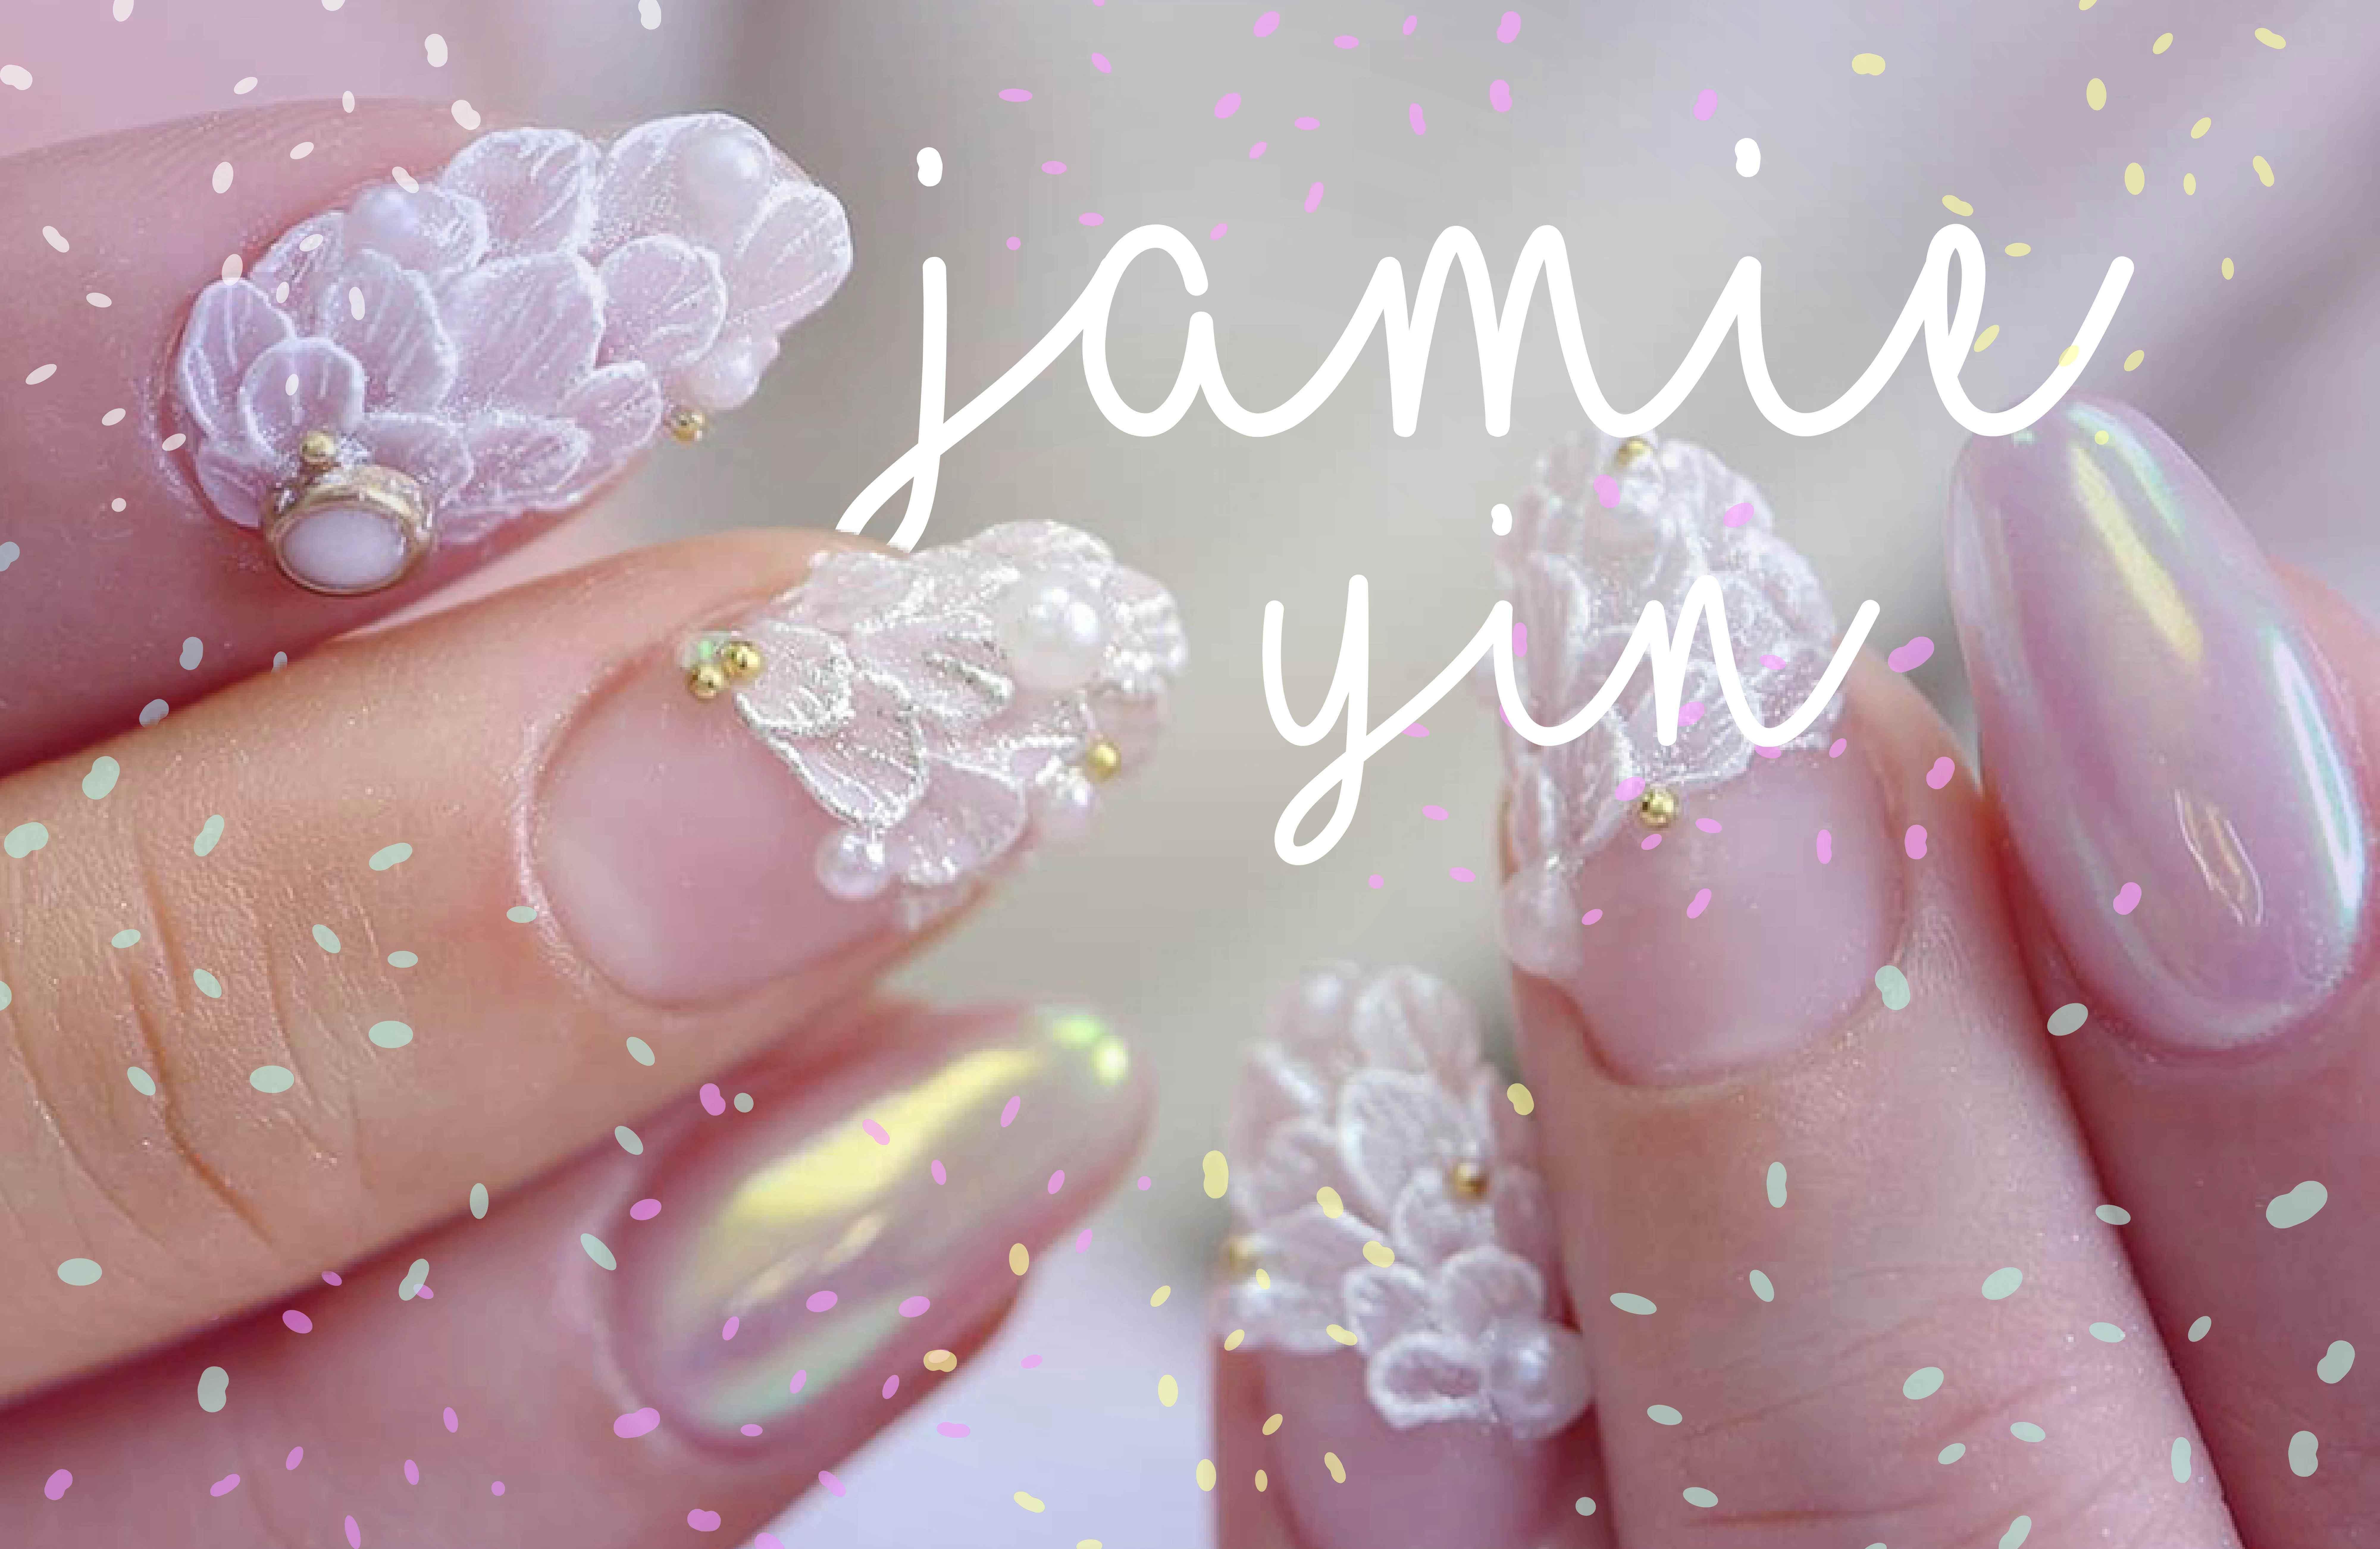 Akzentz Pro and Swarovski Authorized Nail Art Educator—Meet our Nail Studio Instructor Jamie Yin!